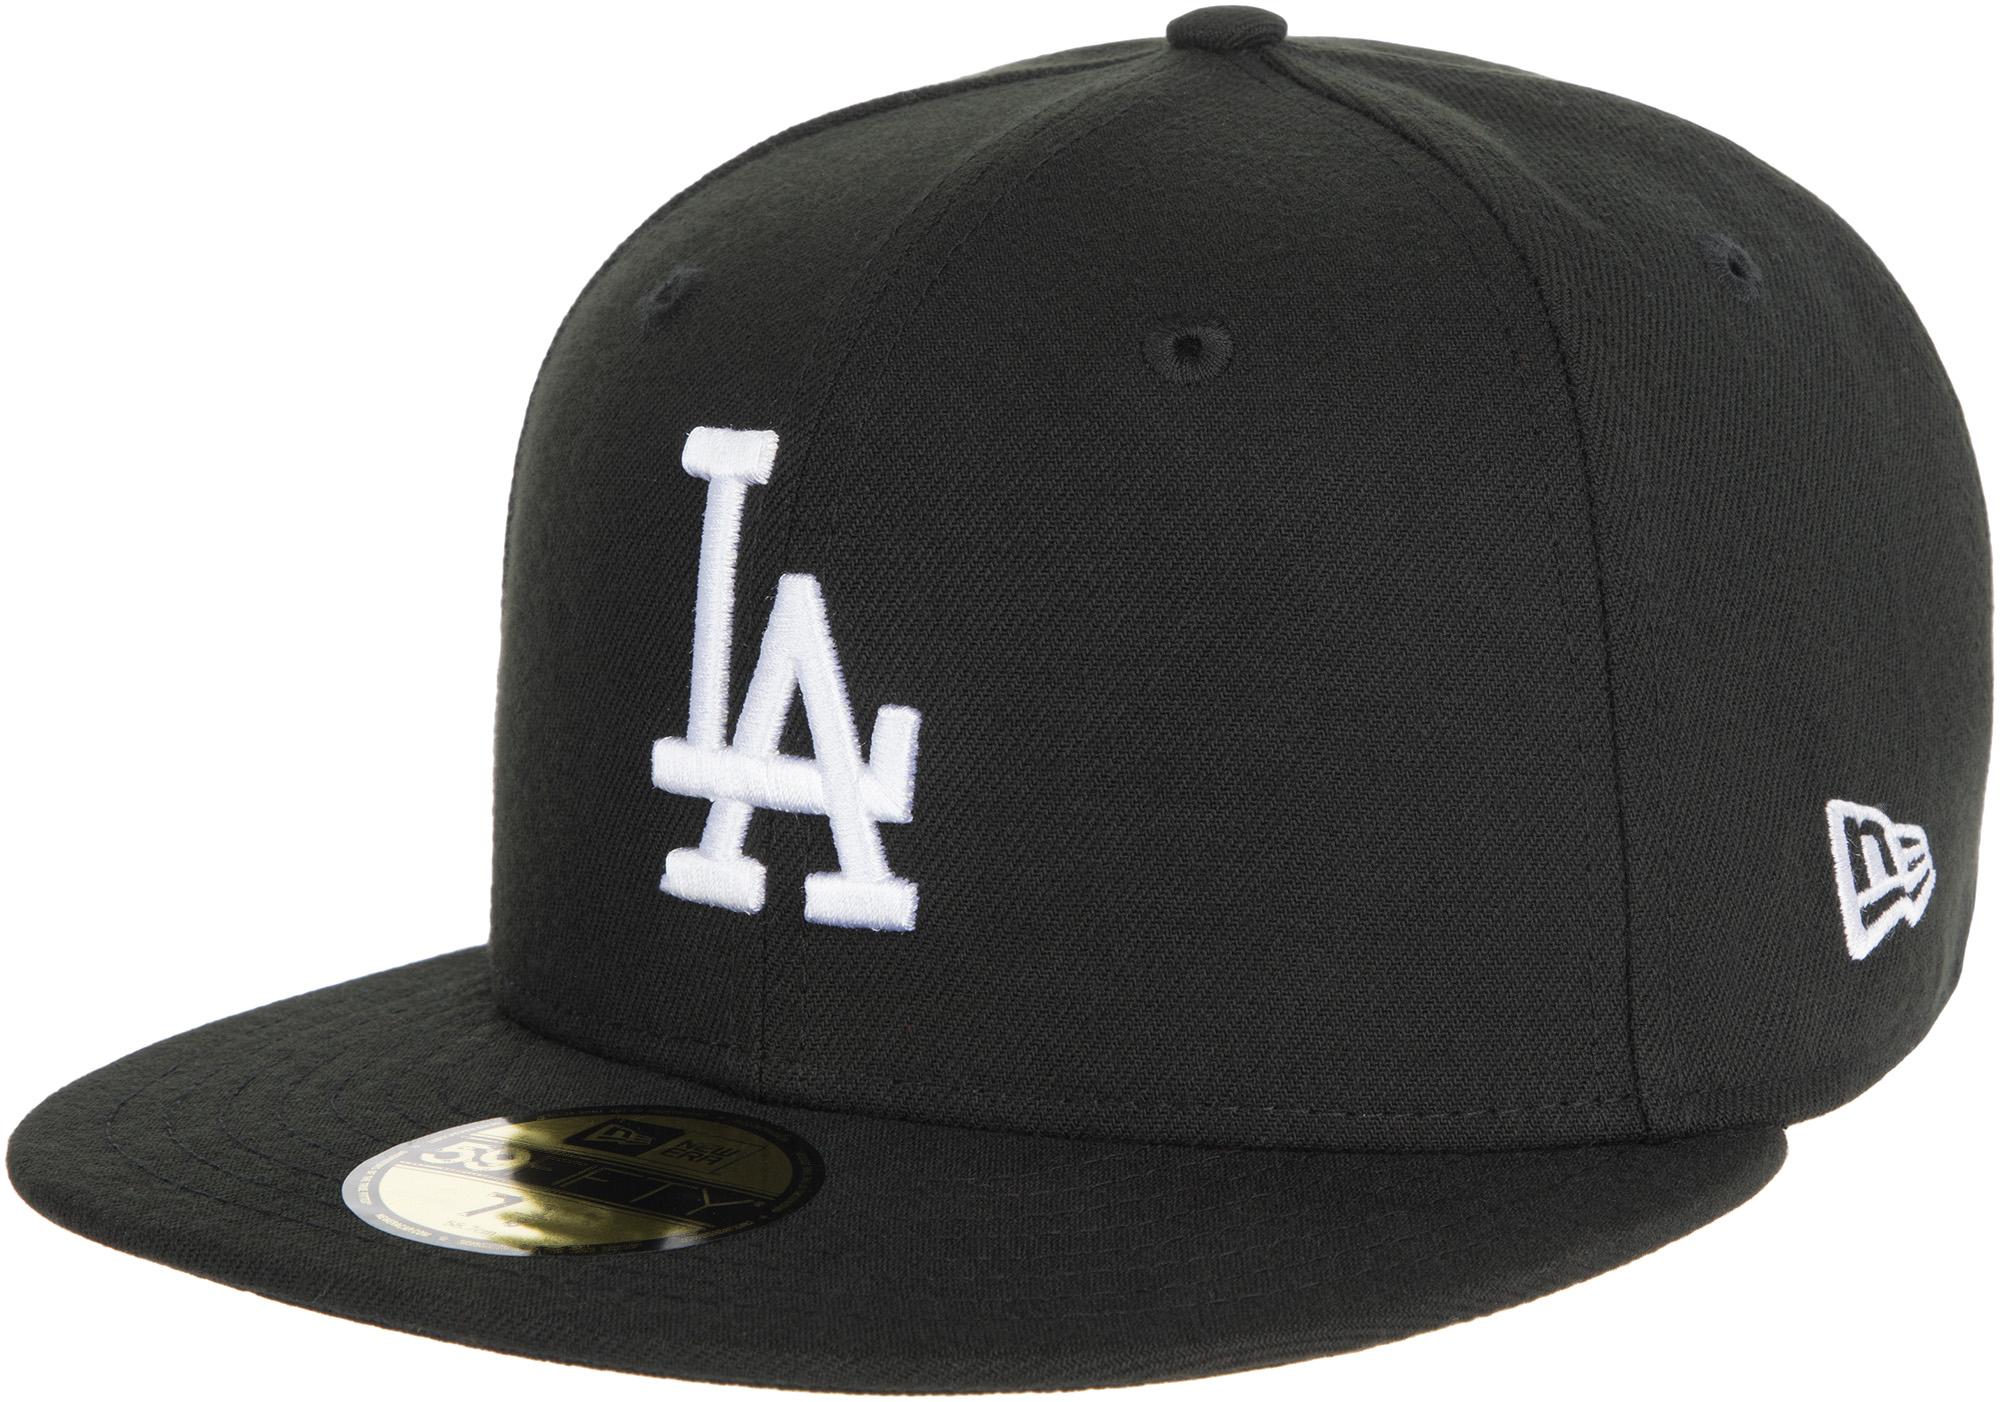 New Era Бейсболка New Era MLB Los Angeles Dodgers, размер 58 худи print bar los angeles